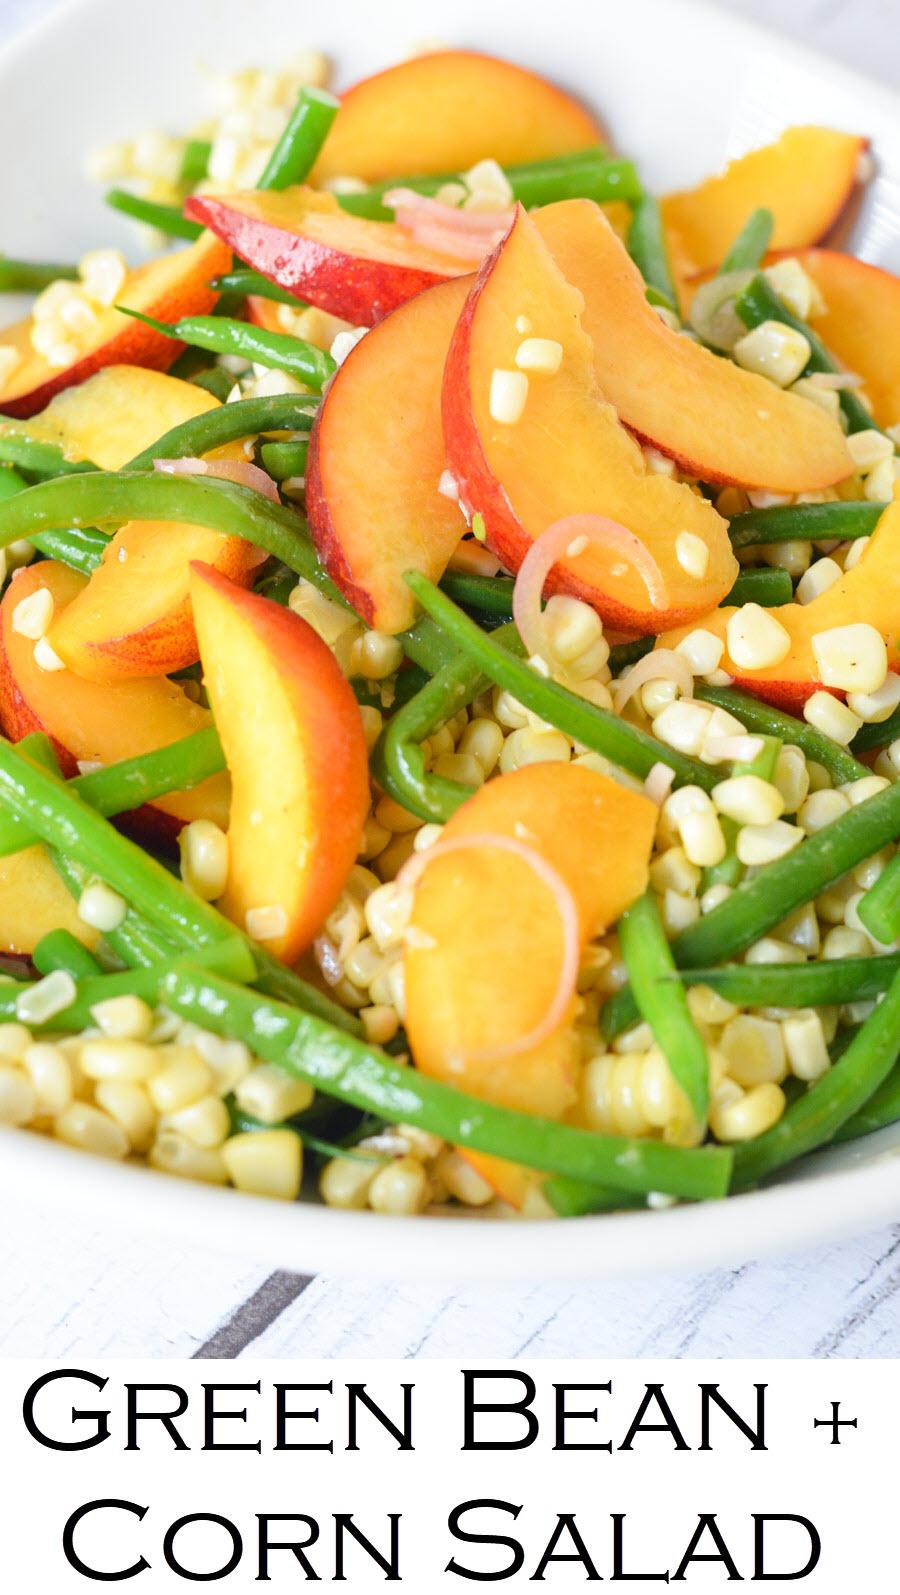 Green Bean, Peach, Corn Salad with Summer Fruits and Vegetables. #healthy #foodblog #sidedish #potluck #july4 #bbq #homemade #corn #peaches #greenbeans #plantbased #vegan #vegetarian #healthy #lmrecipes